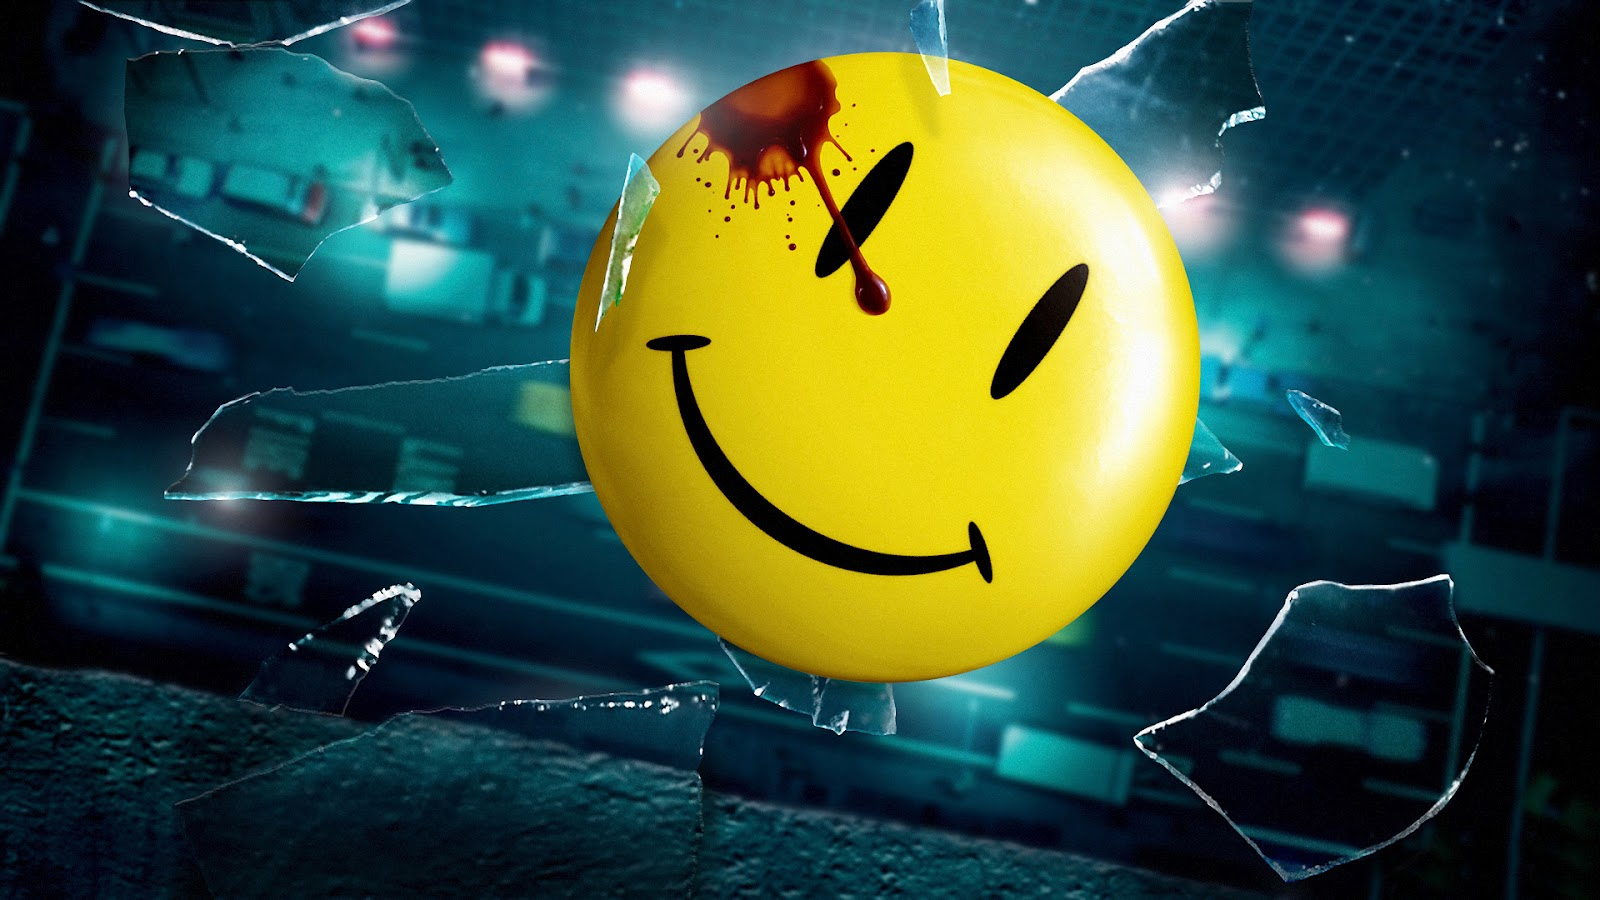 http://4.bp.blogspot.com/-r1xry3FRESI/UCdnN8dUZjI/AAAAAAAAAPo/lEFpFMAaDXc/s1600/watchmen_smiley-HD.jpg